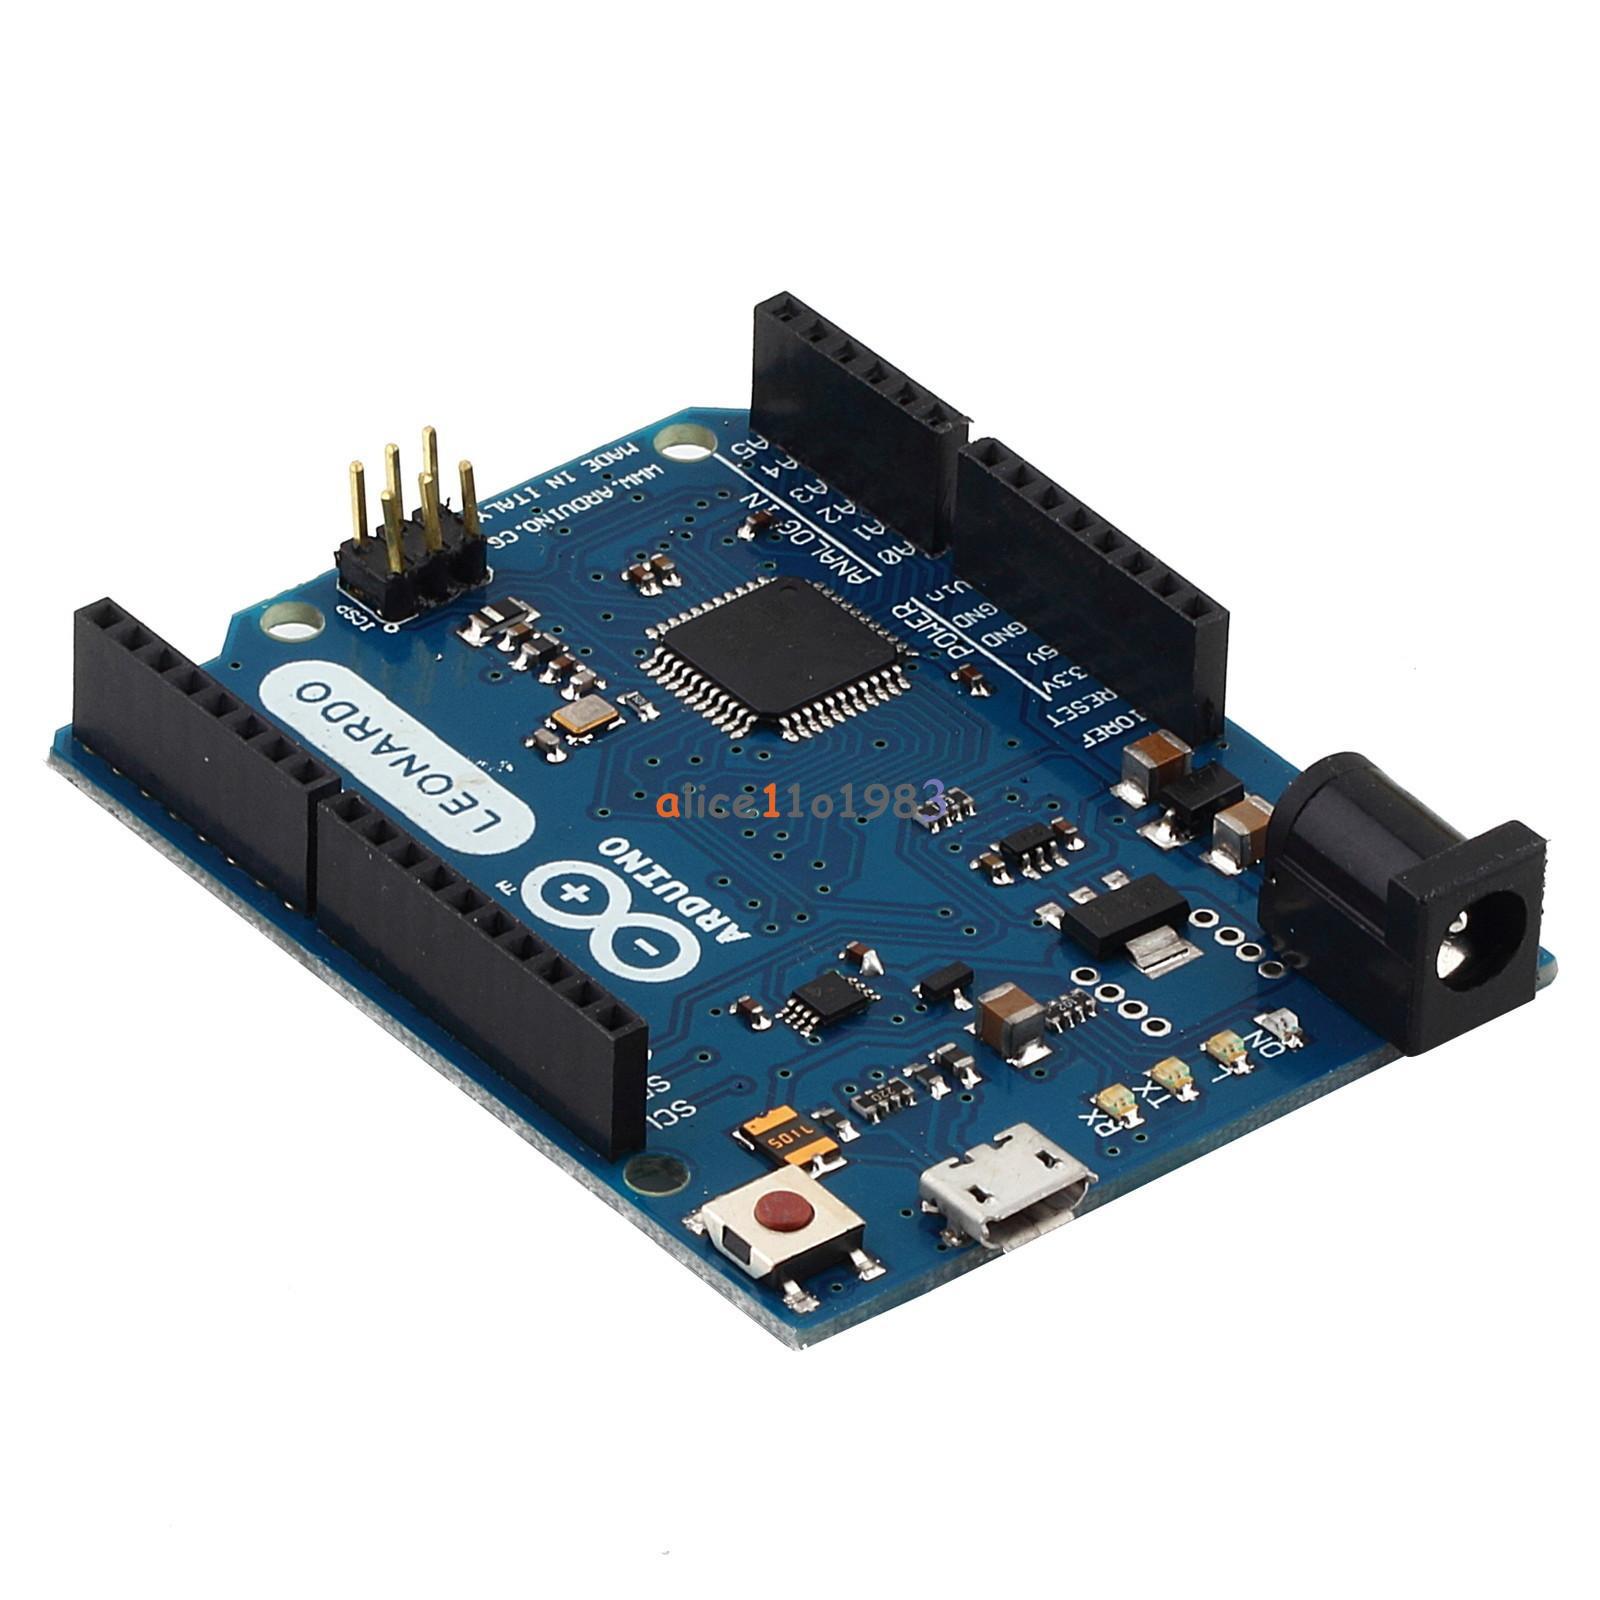 leonardo r3 pro micro atmega32u4 board arduino compatible ide free usb cable ebay. Black Bedroom Furniture Sets. Home Design Ideas